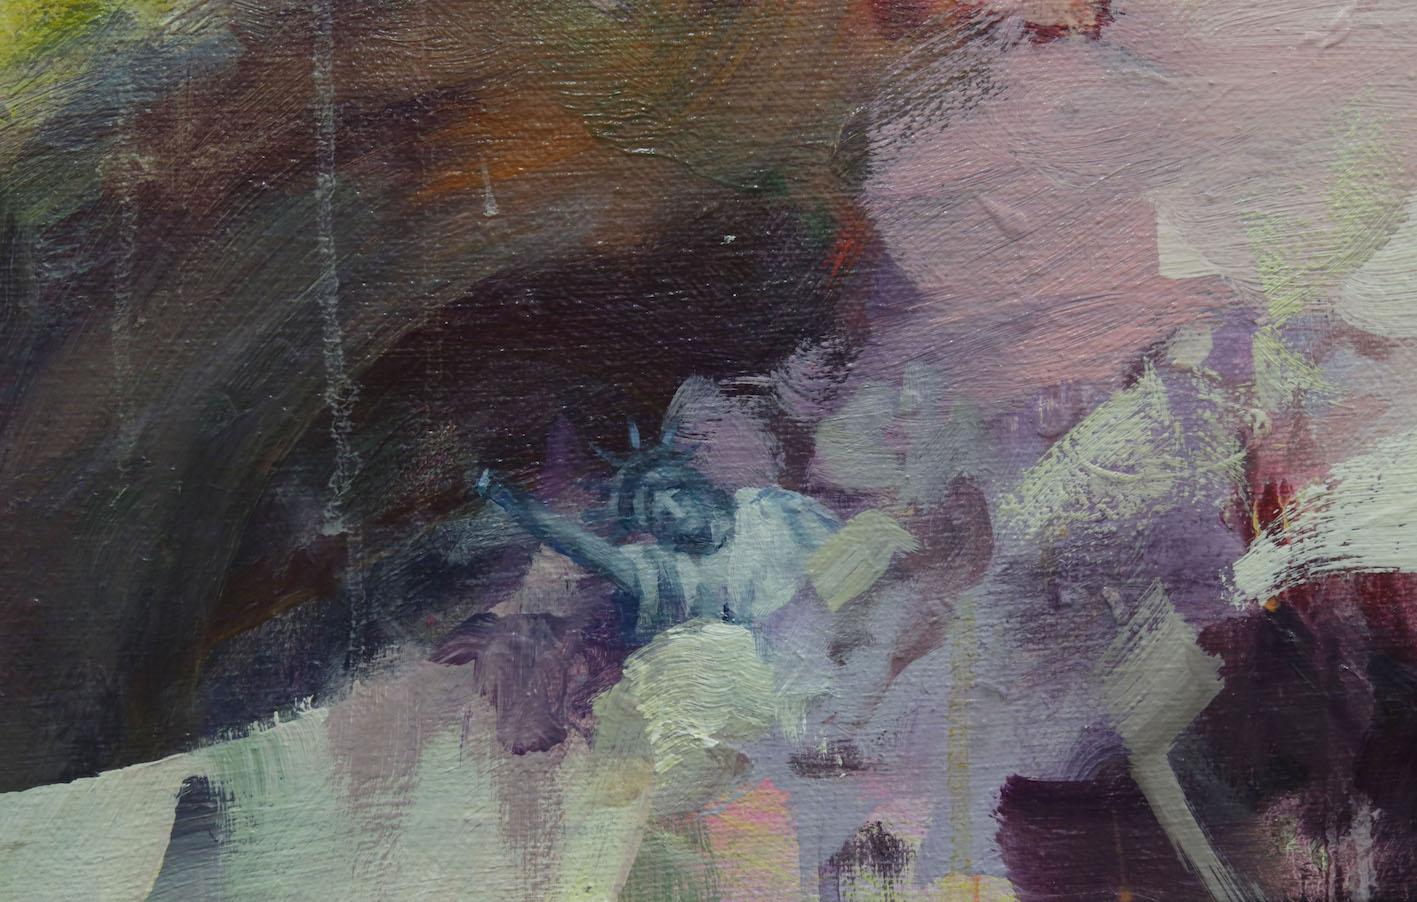 Peihang Huang - The Search (Detail)